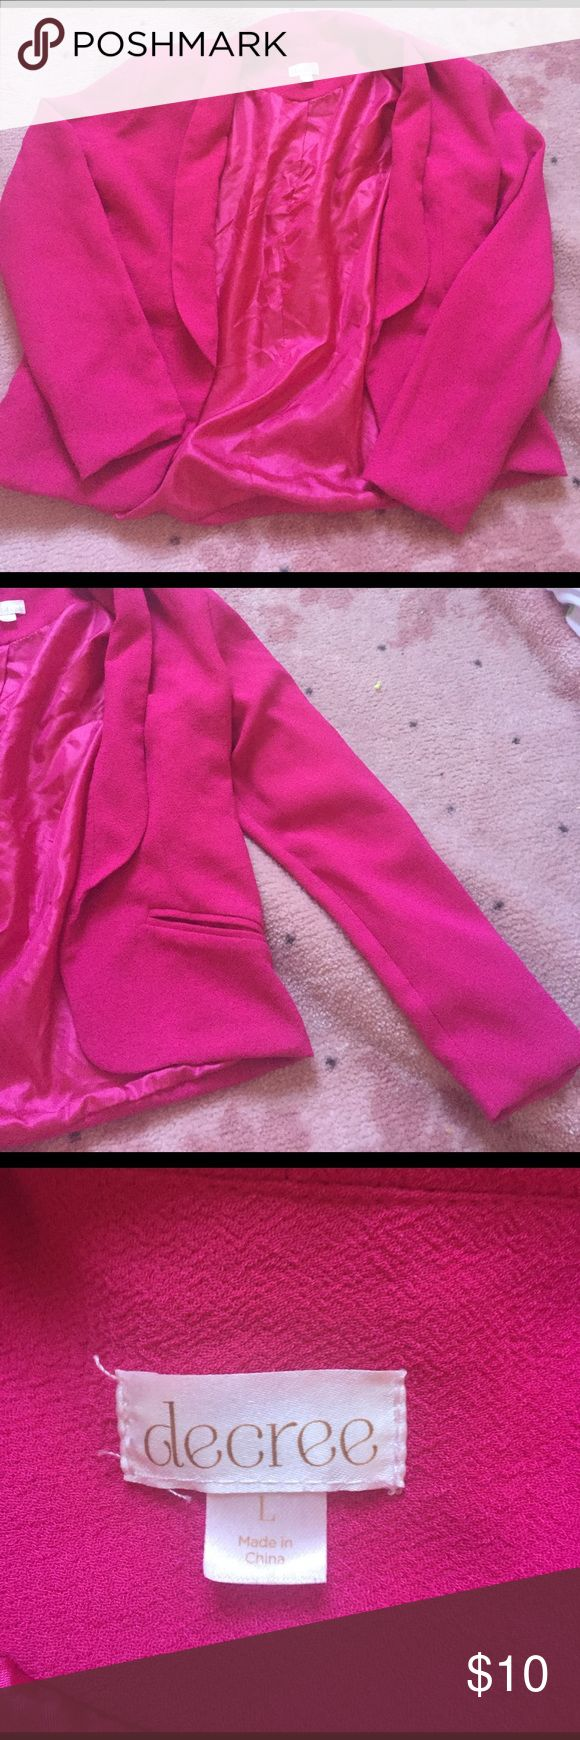 Hot pink blazer Decree size L hot pink blazer Decree Jackets & Coats Blazers